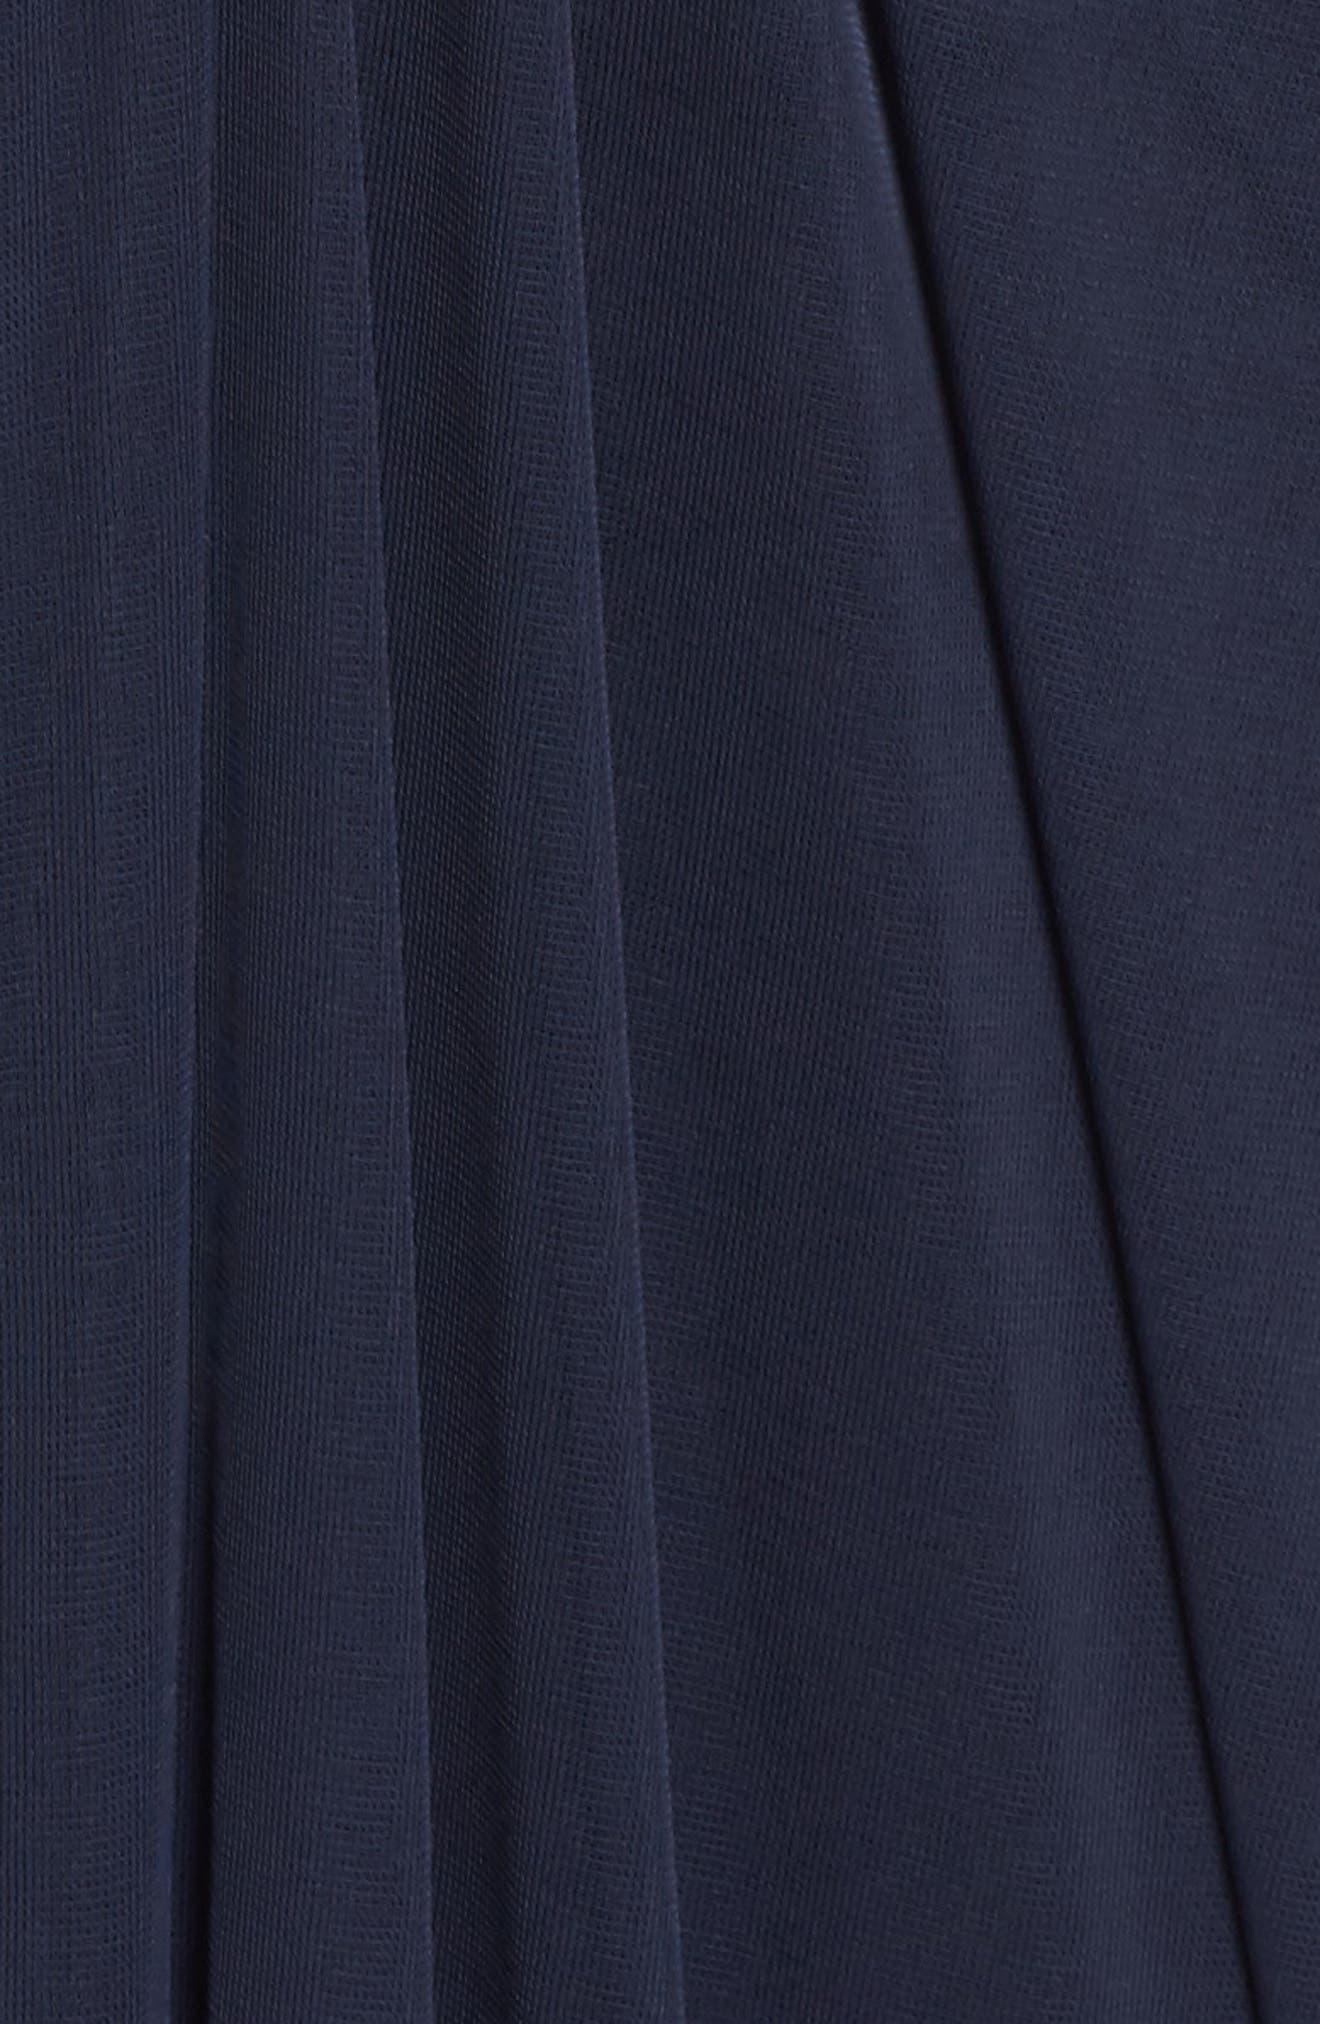 Lace Yoke Drape Gown,                             Alternate thumbnail 12, color,